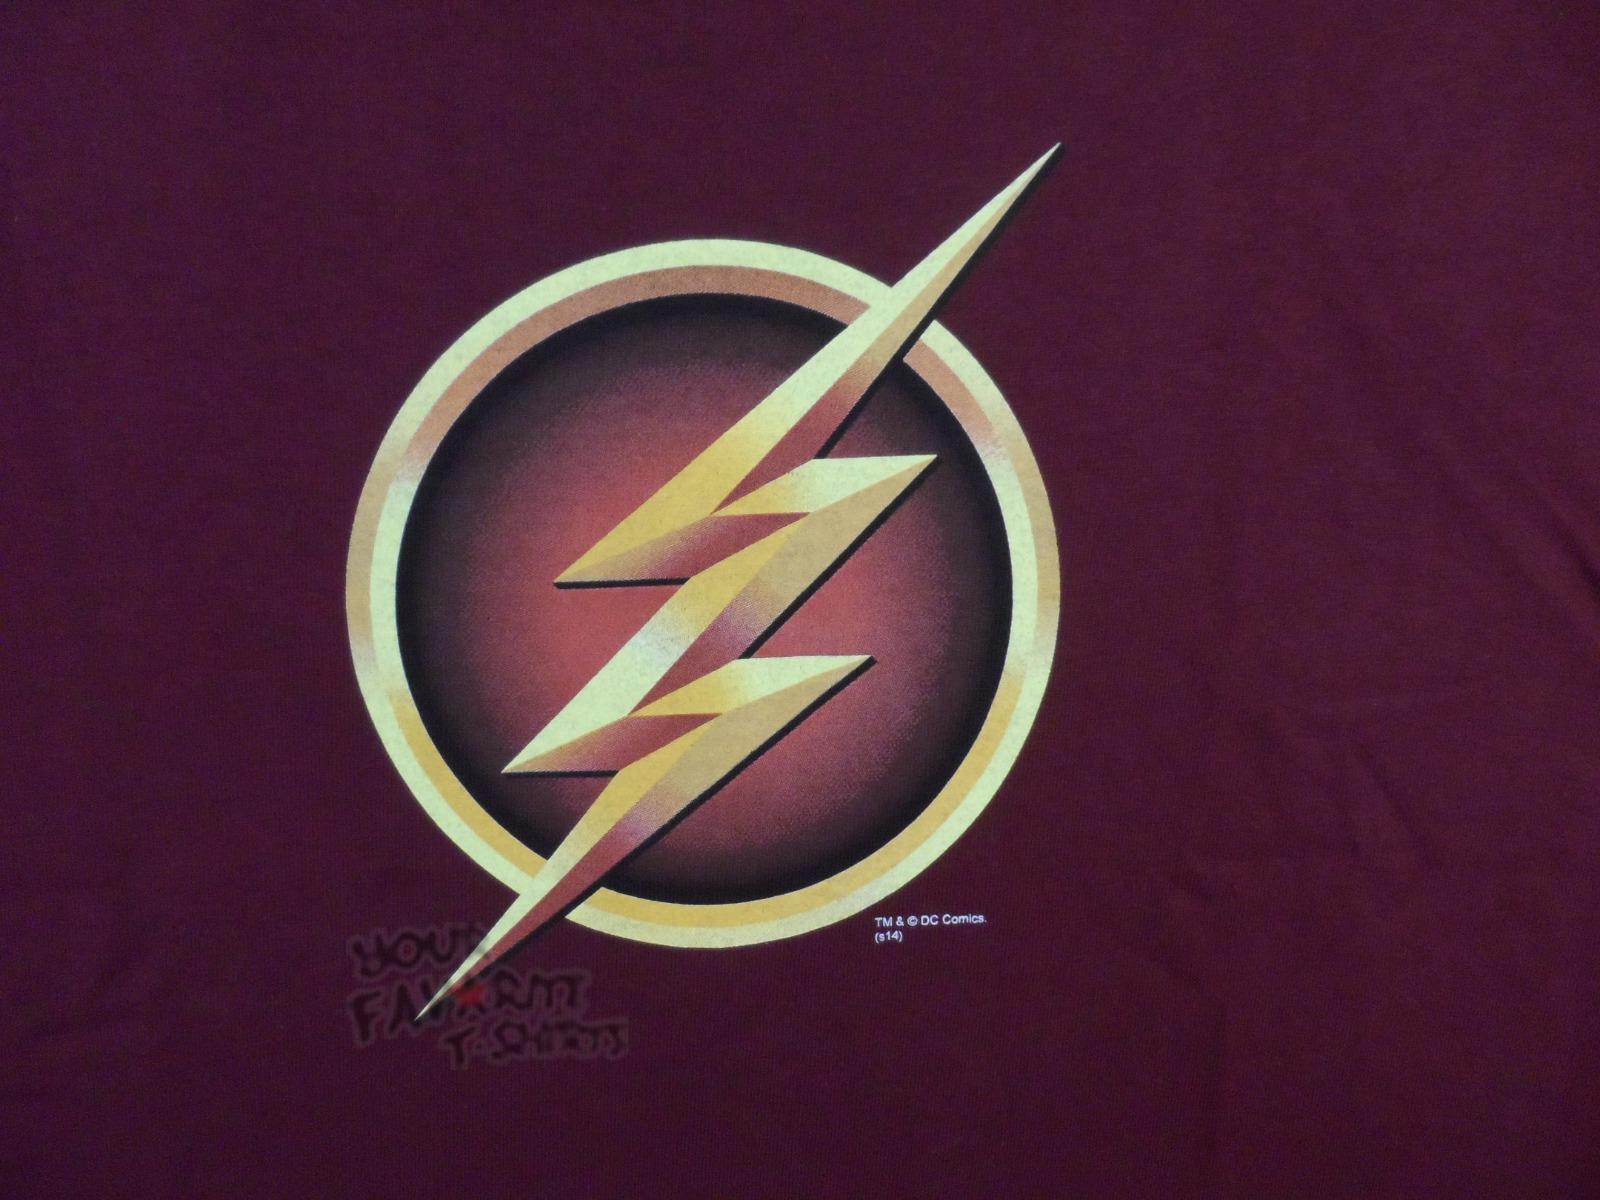 the flash tv show logo symbol cw dc comics premium. Black Bedroom Furniture Sets. Home Design Ideas